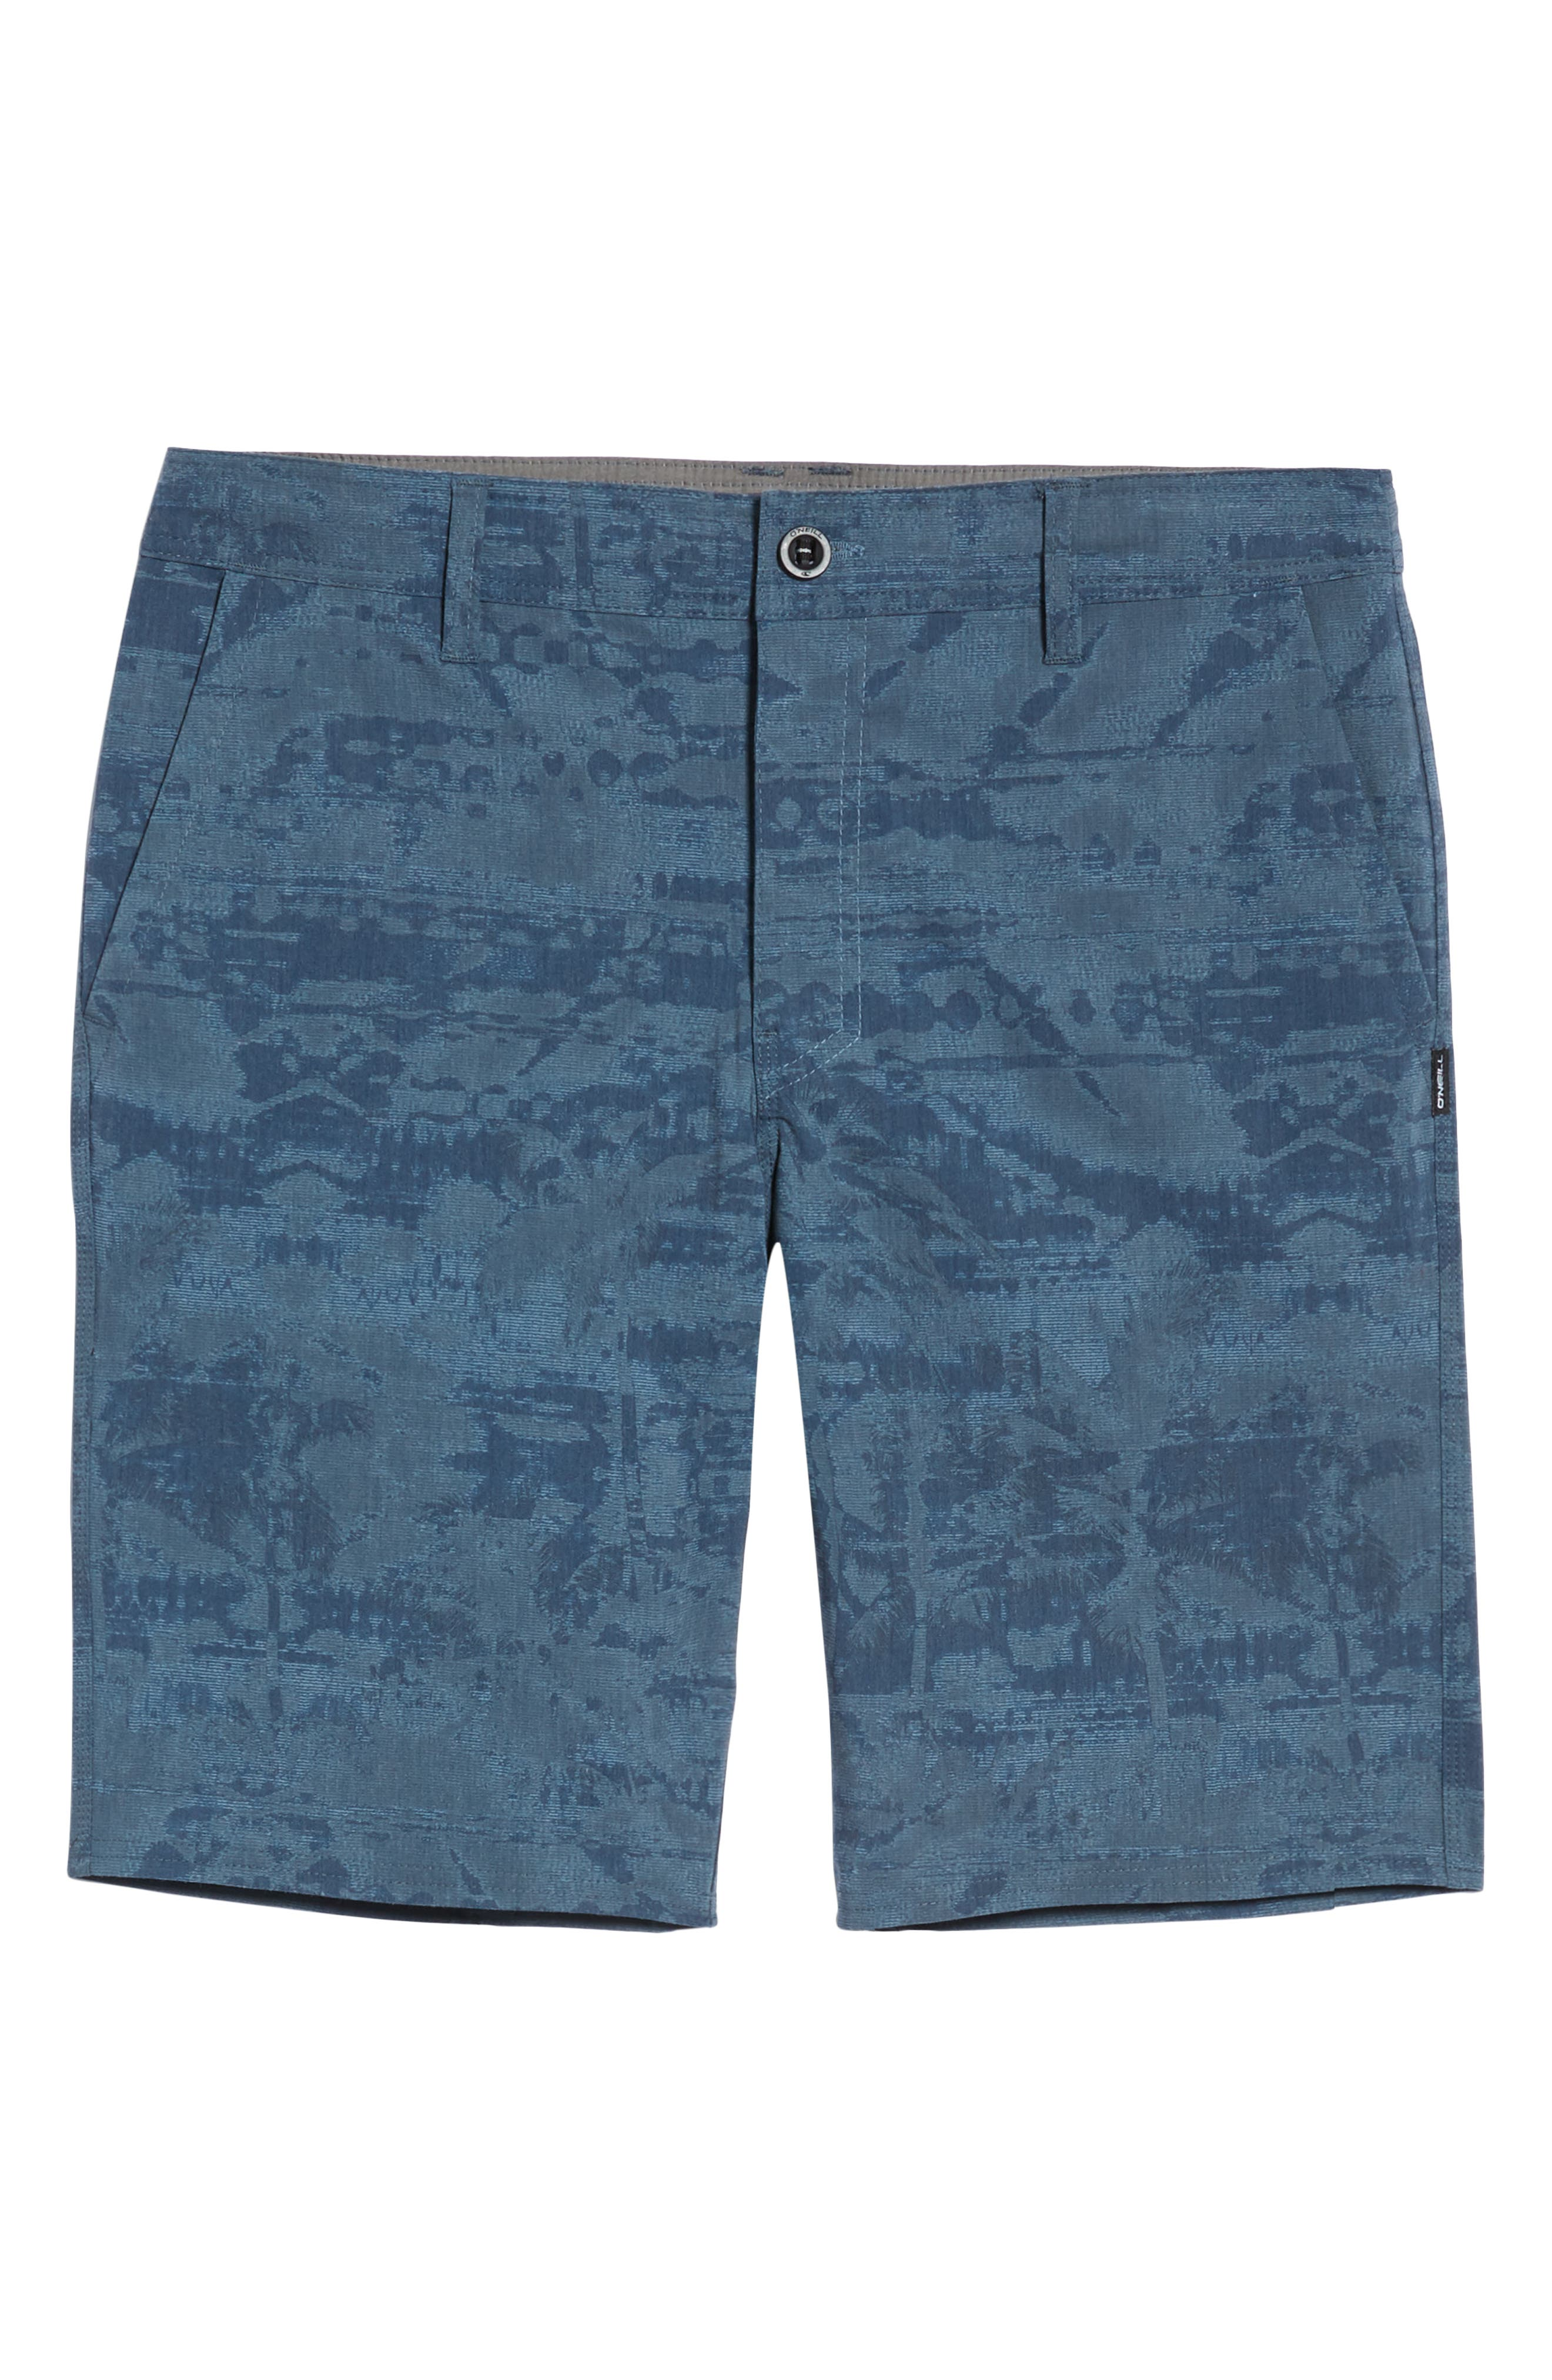 Mixed Hybrid Shorts,                             Alternate thumbnail 6, color,                             410